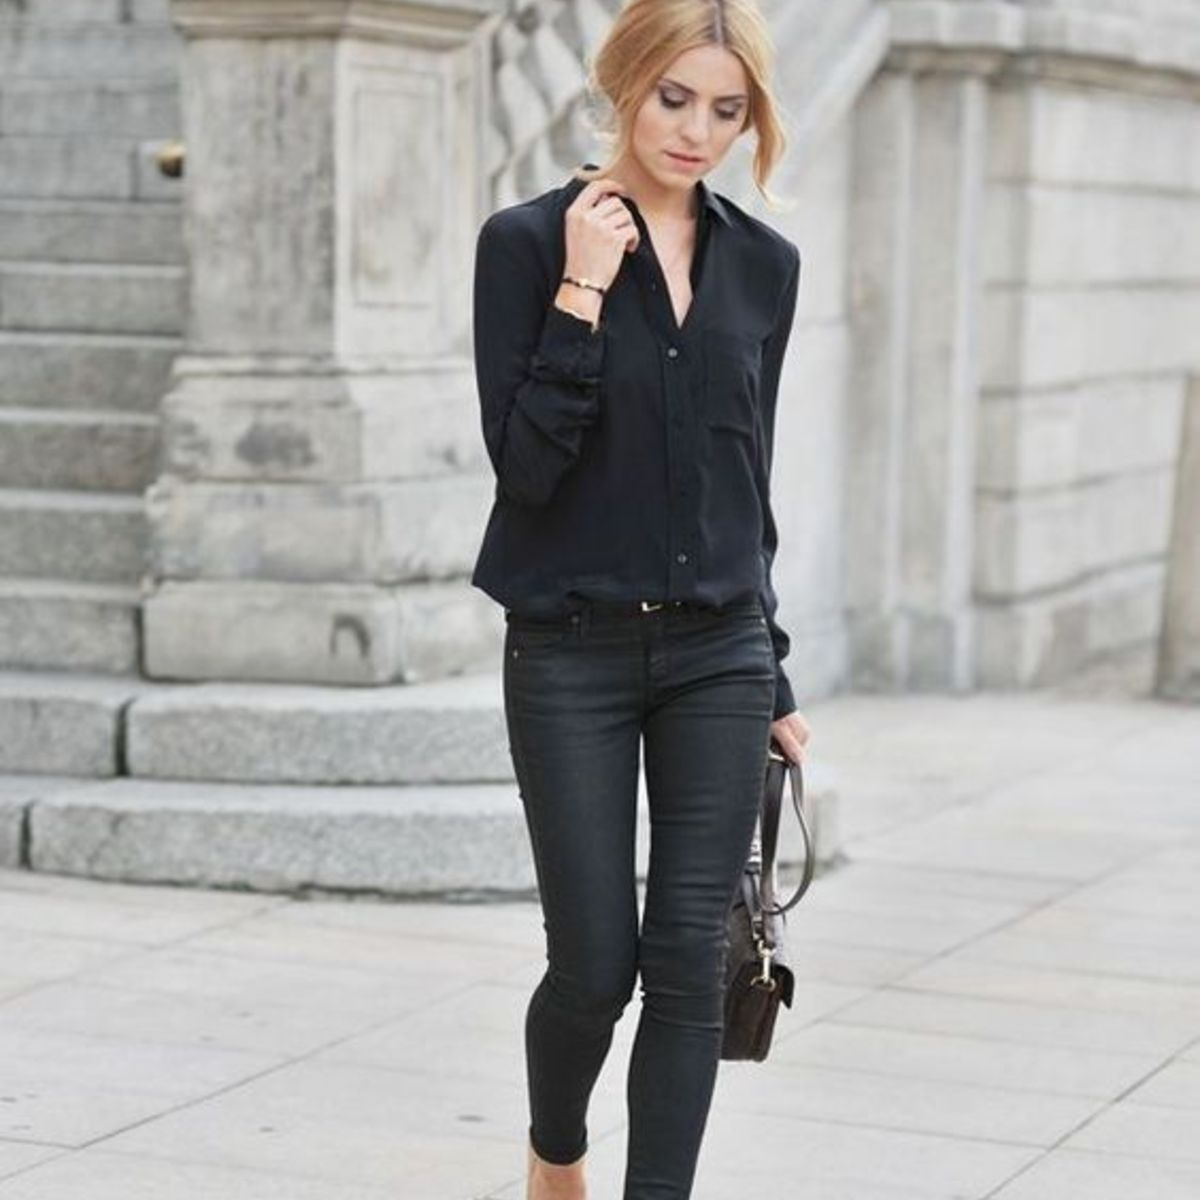 combinar pantalon negro otoño